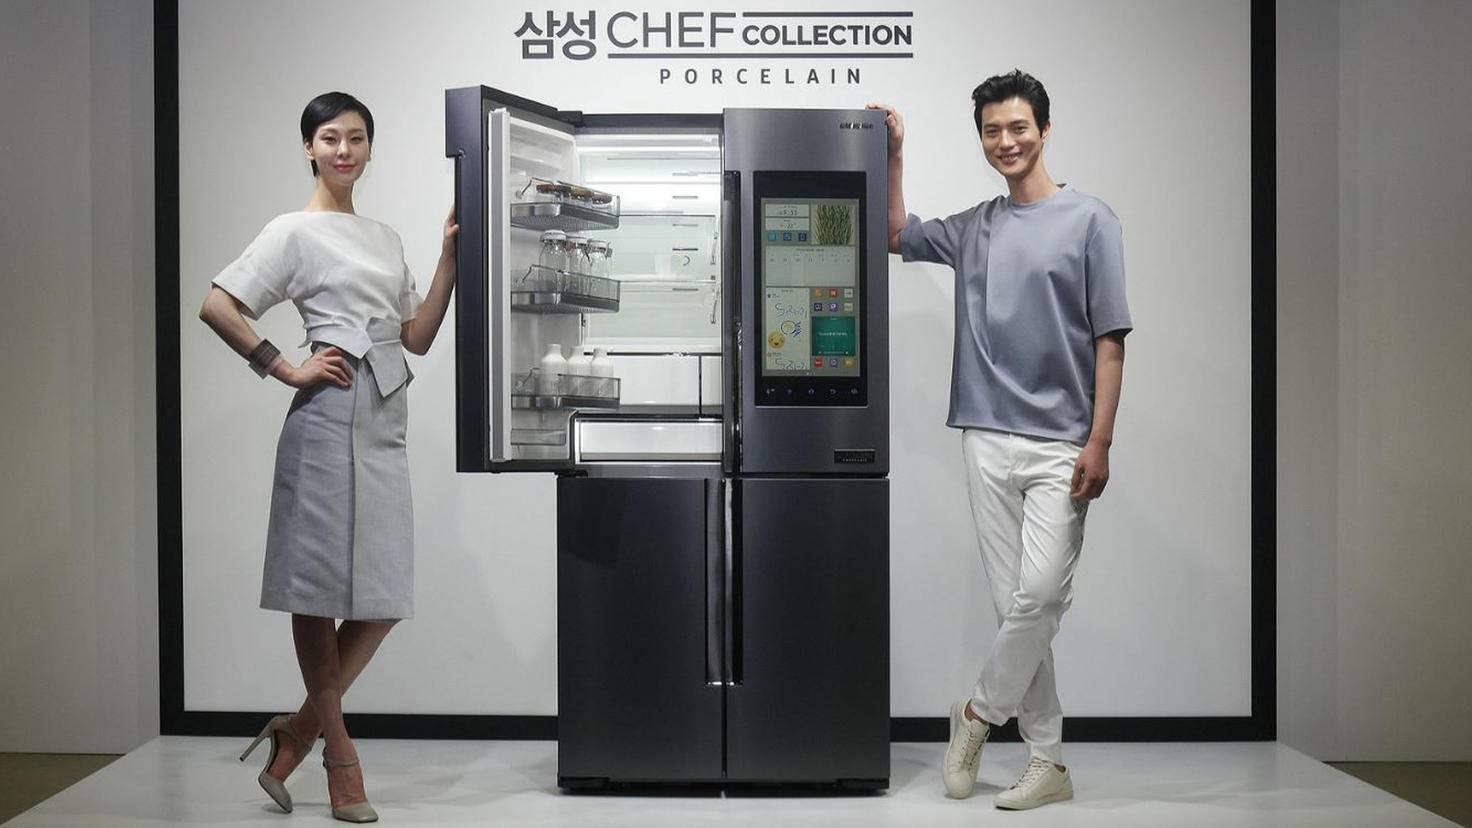 Samsung-High-End-Kühlschrank-Chef Collection-Porzellan-flickr-samsungtomorrow